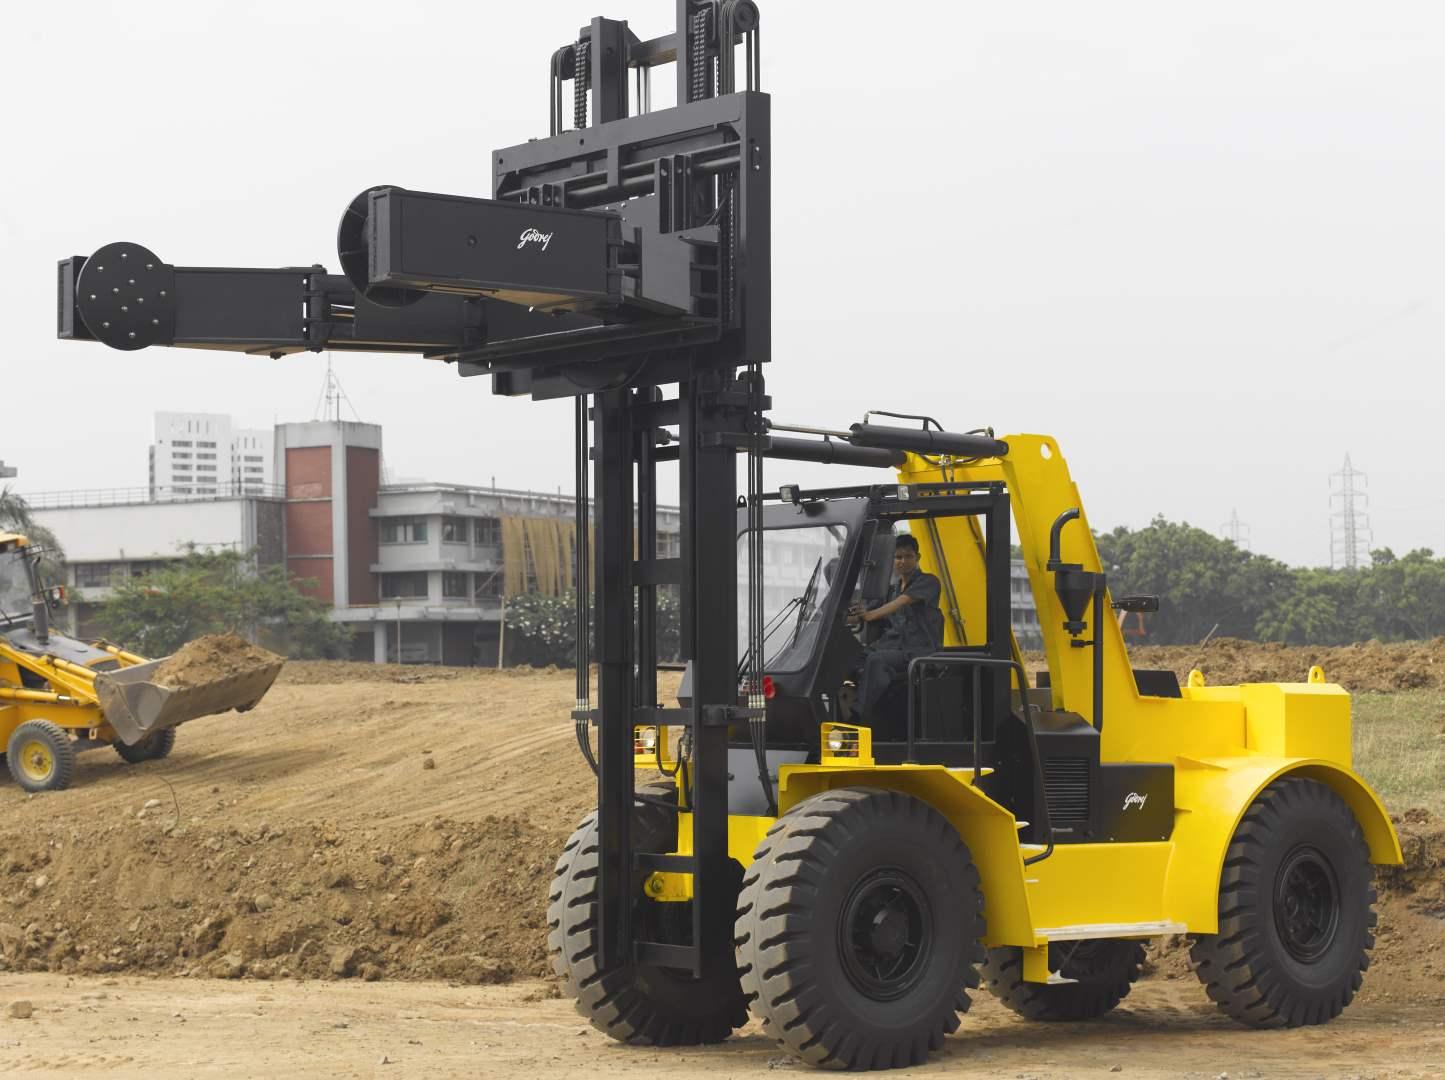 0-5-to-3-5-tonne-Godrej-Tyre-Handler.1